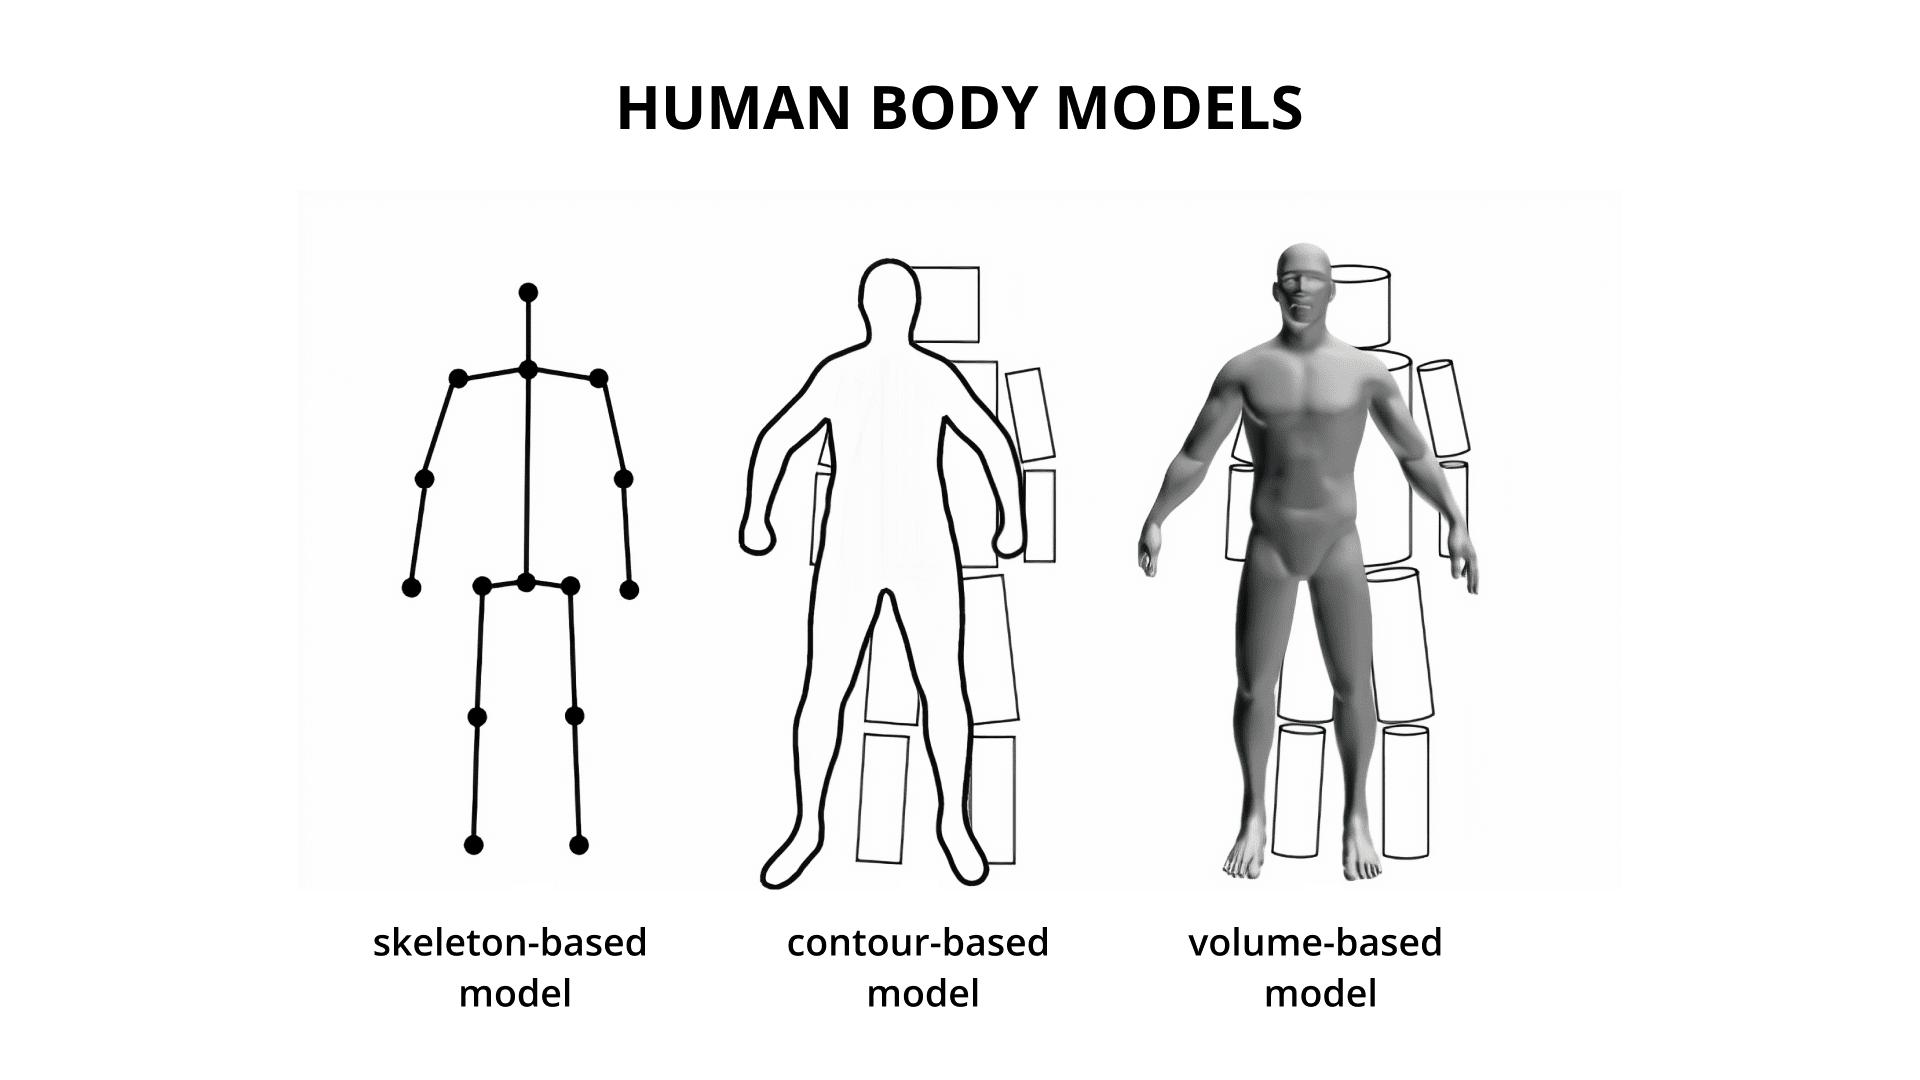 Human body models: skeleton-based, contour-based, and volume-based